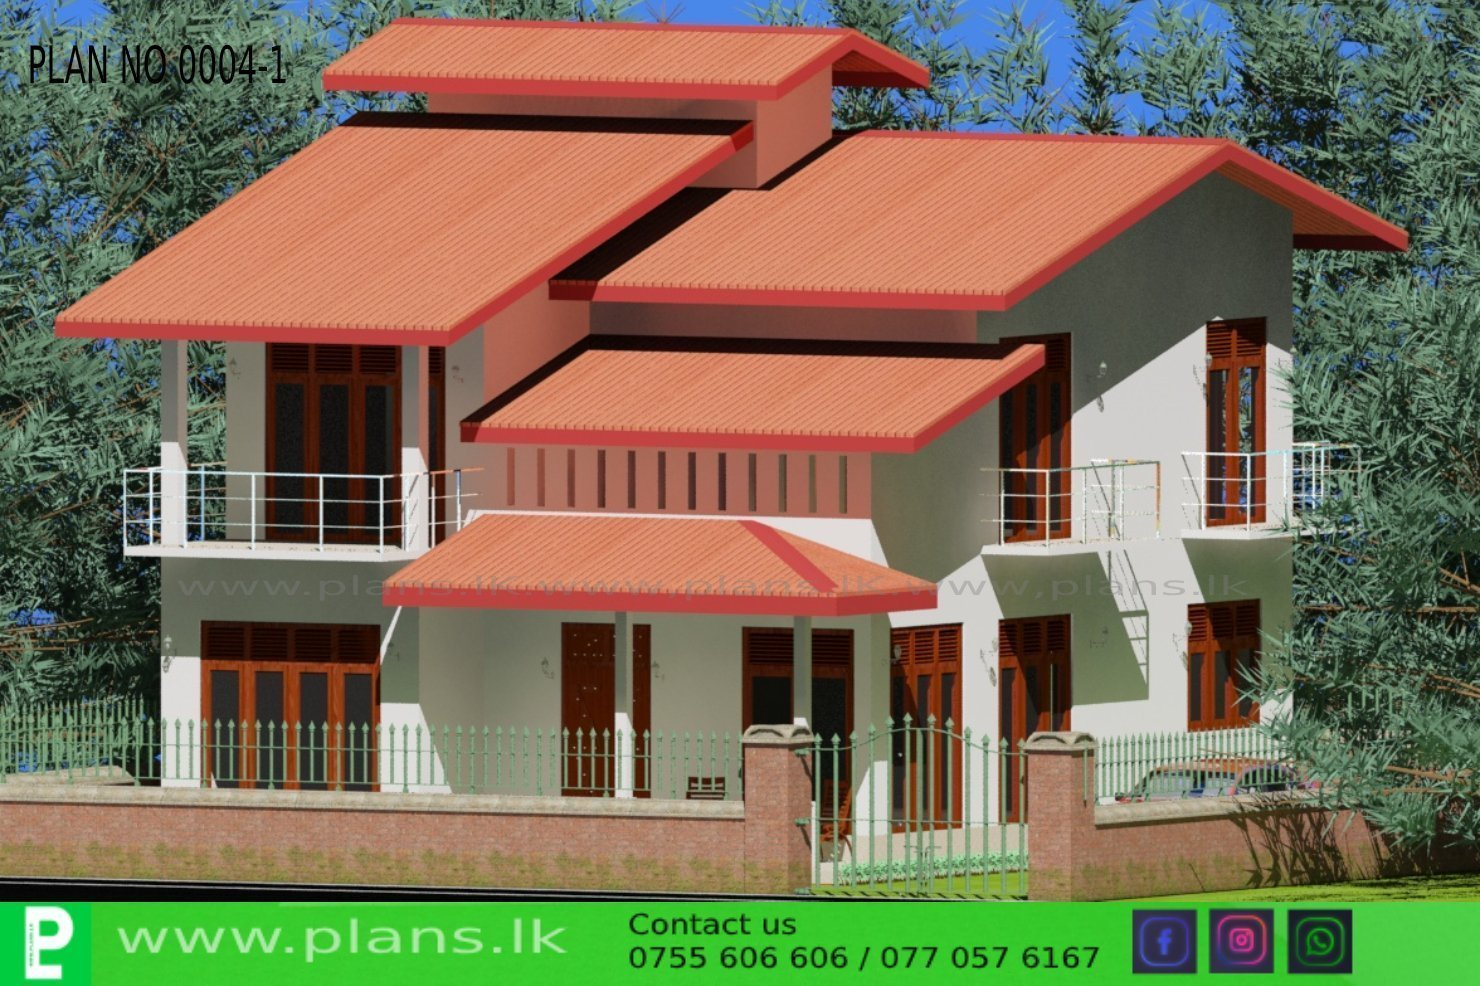 Plan 0004 1 Plans Lk Home Plans Sri Lanka